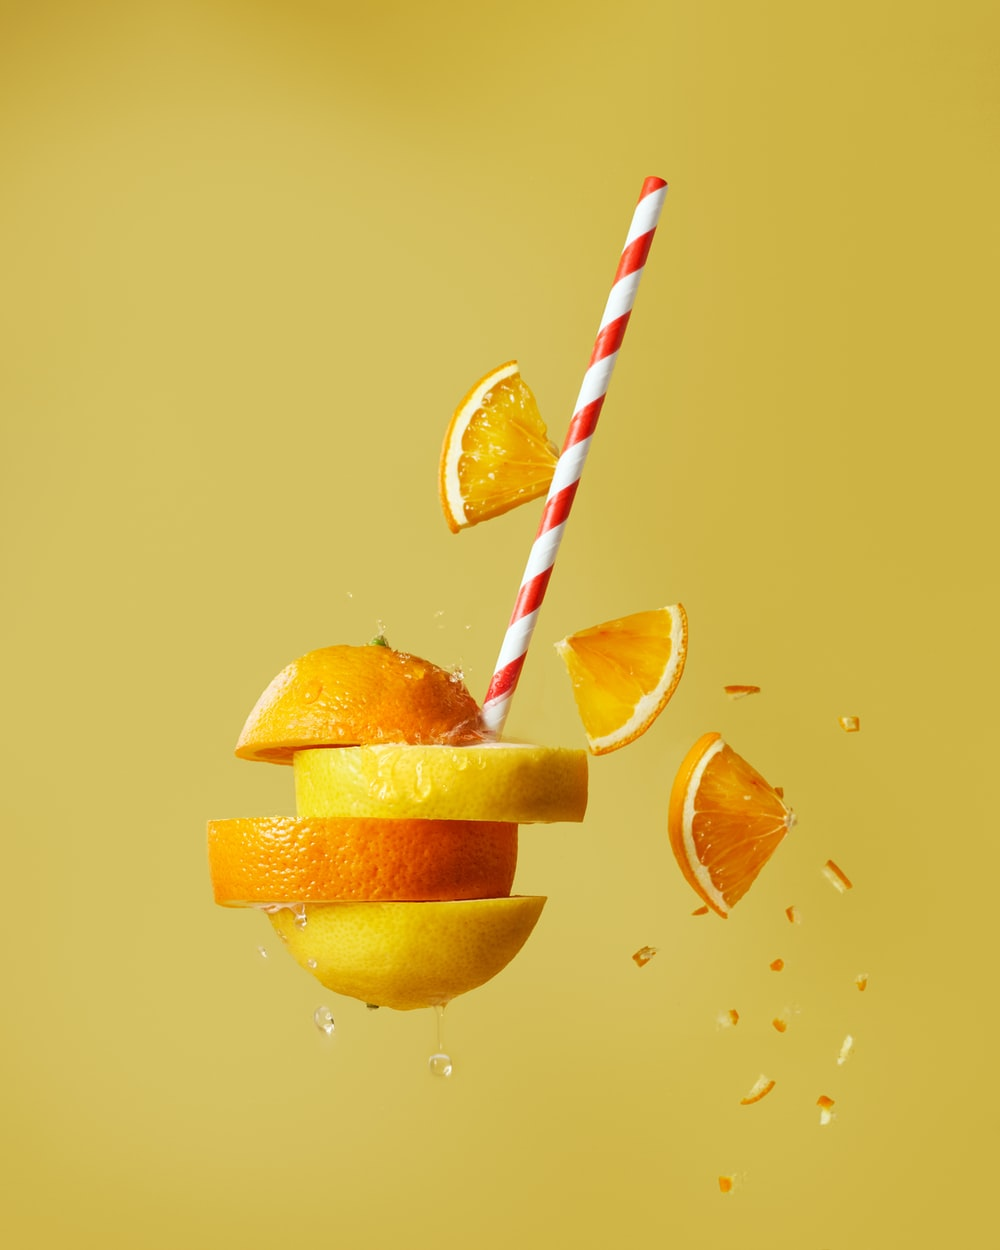 sliced orange fruit with straw